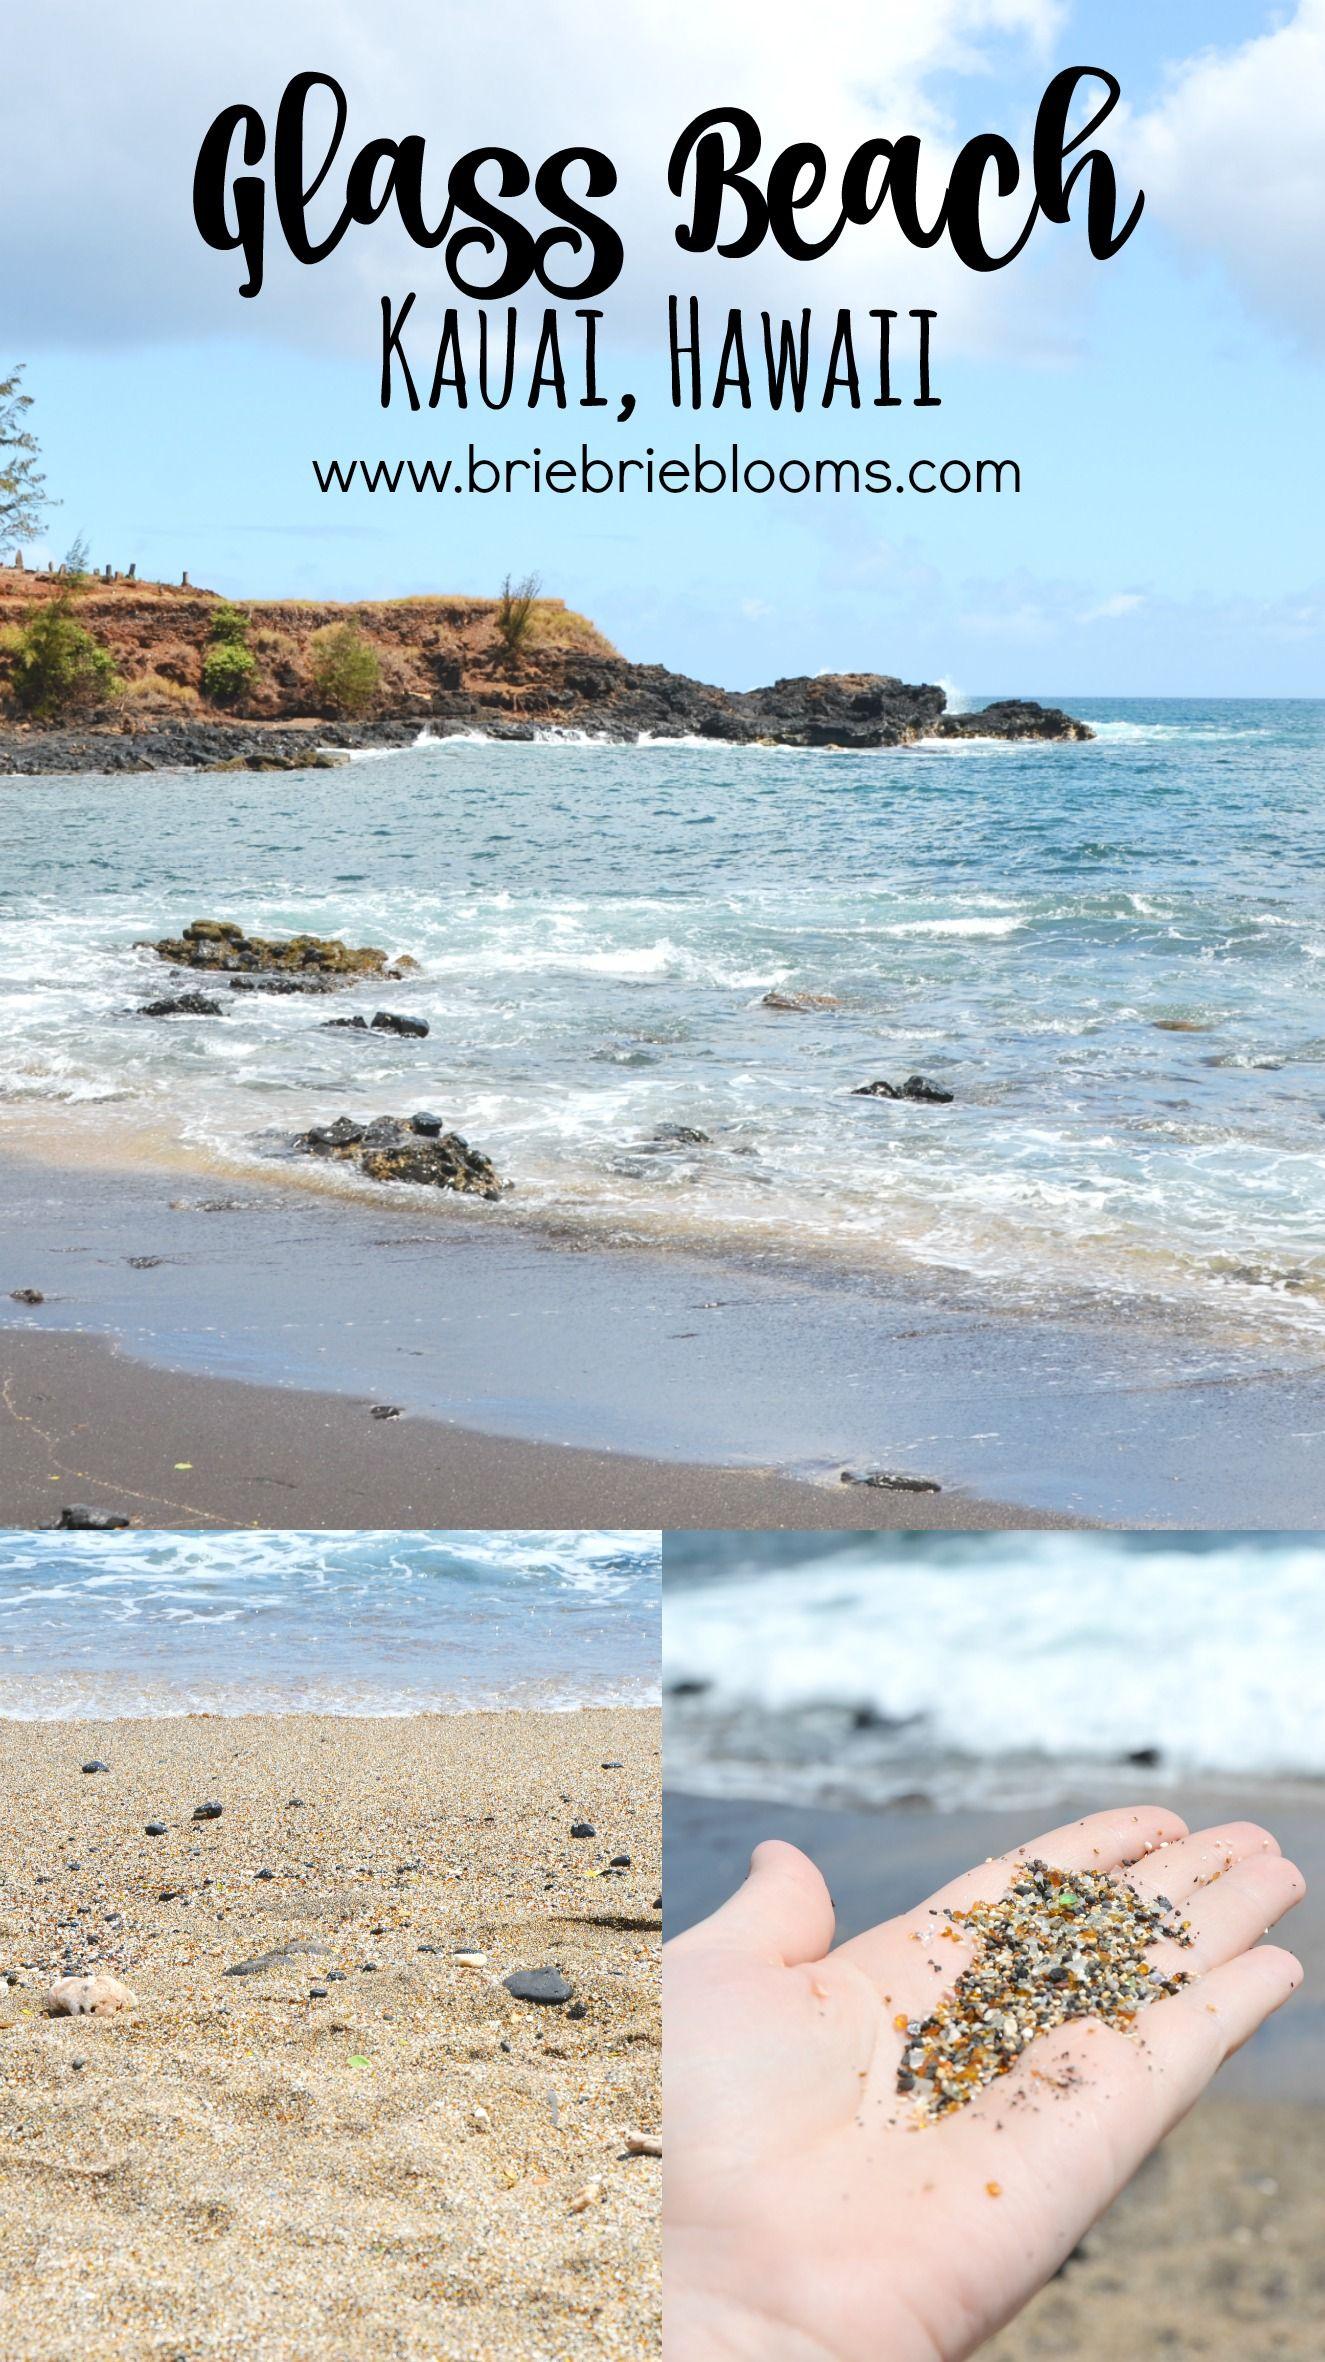 Kauai Glass Beach, Hawaii Family Travel